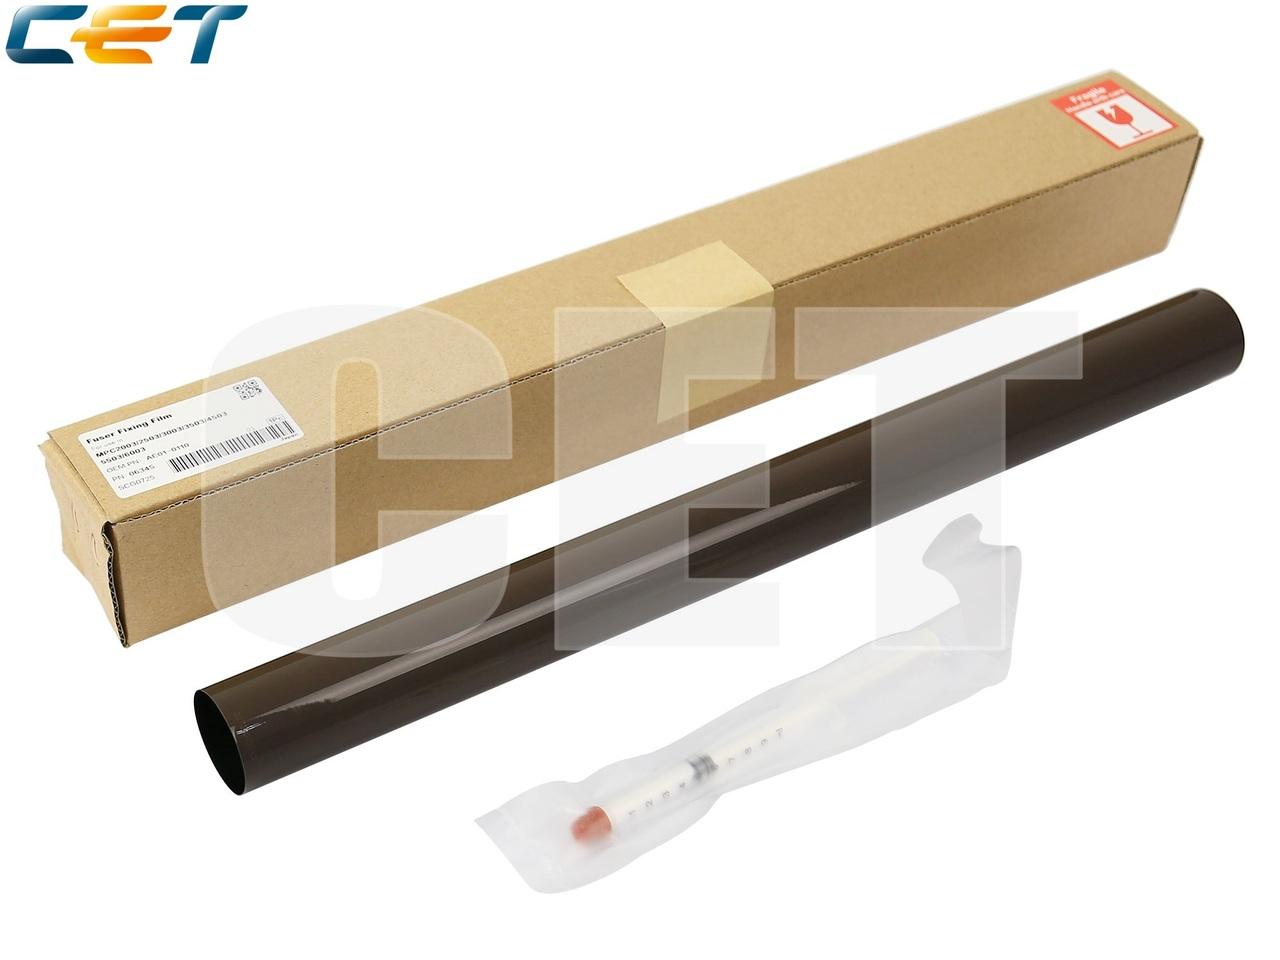 Термопленка AE01-0110 для RICOHMPC2003/3503/MPC4503/5503/6003 (CET), CET6345